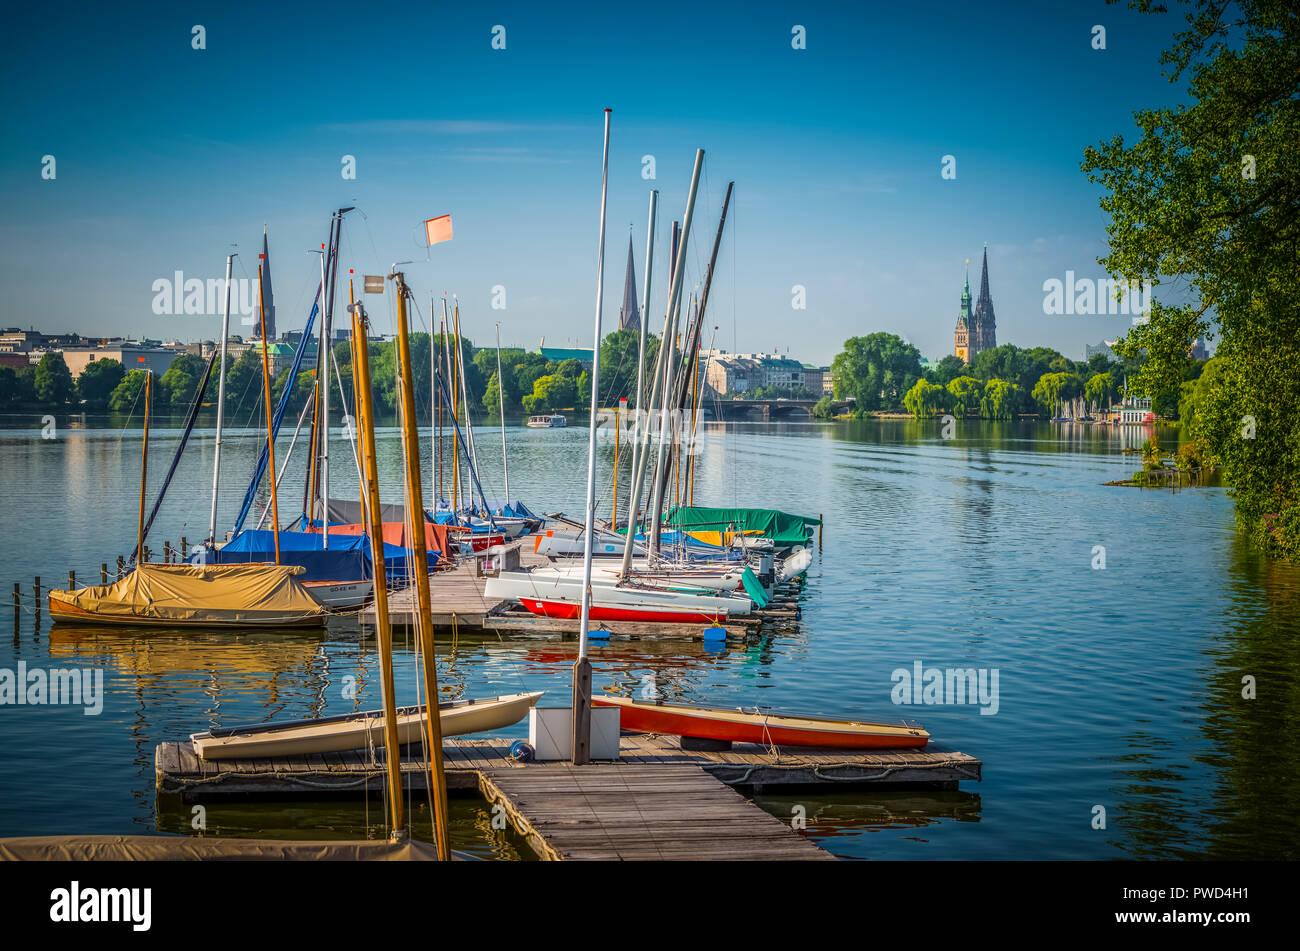 Deutschland, Hamburg, Alster, Aussenalster, segeln, Segelboot - Stock Image